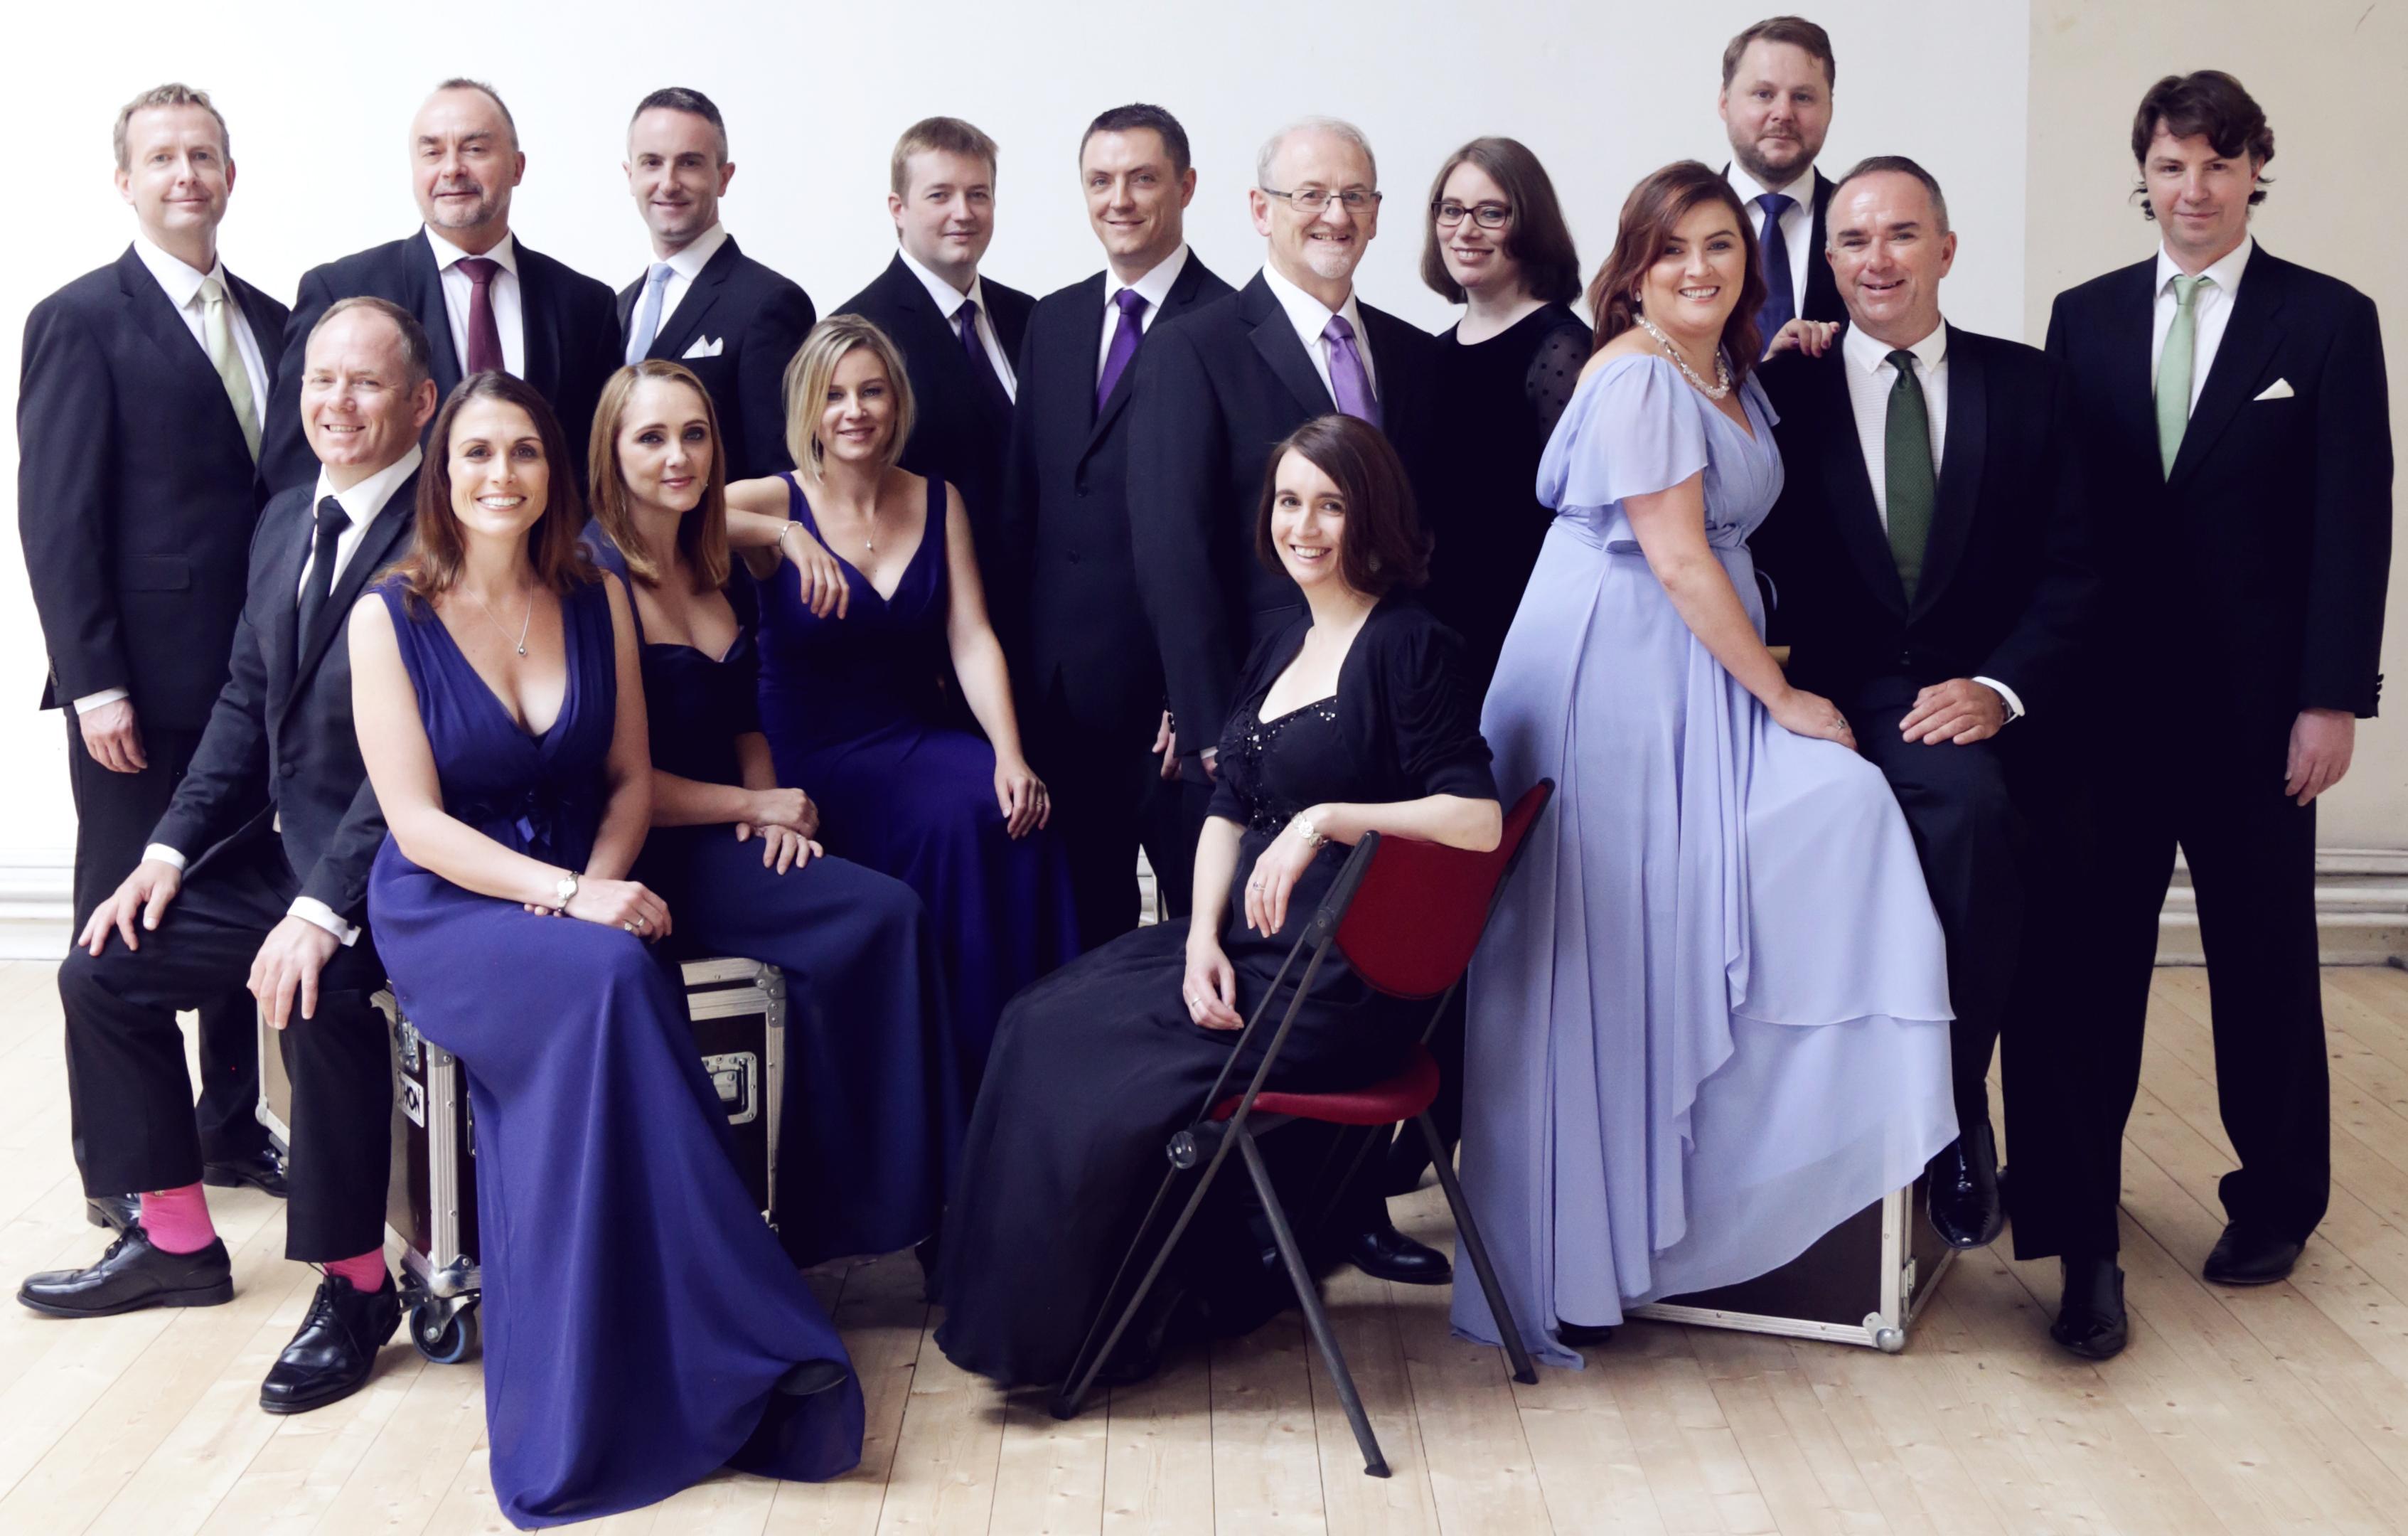 The Great Mystery - Chamber Choir Ireland